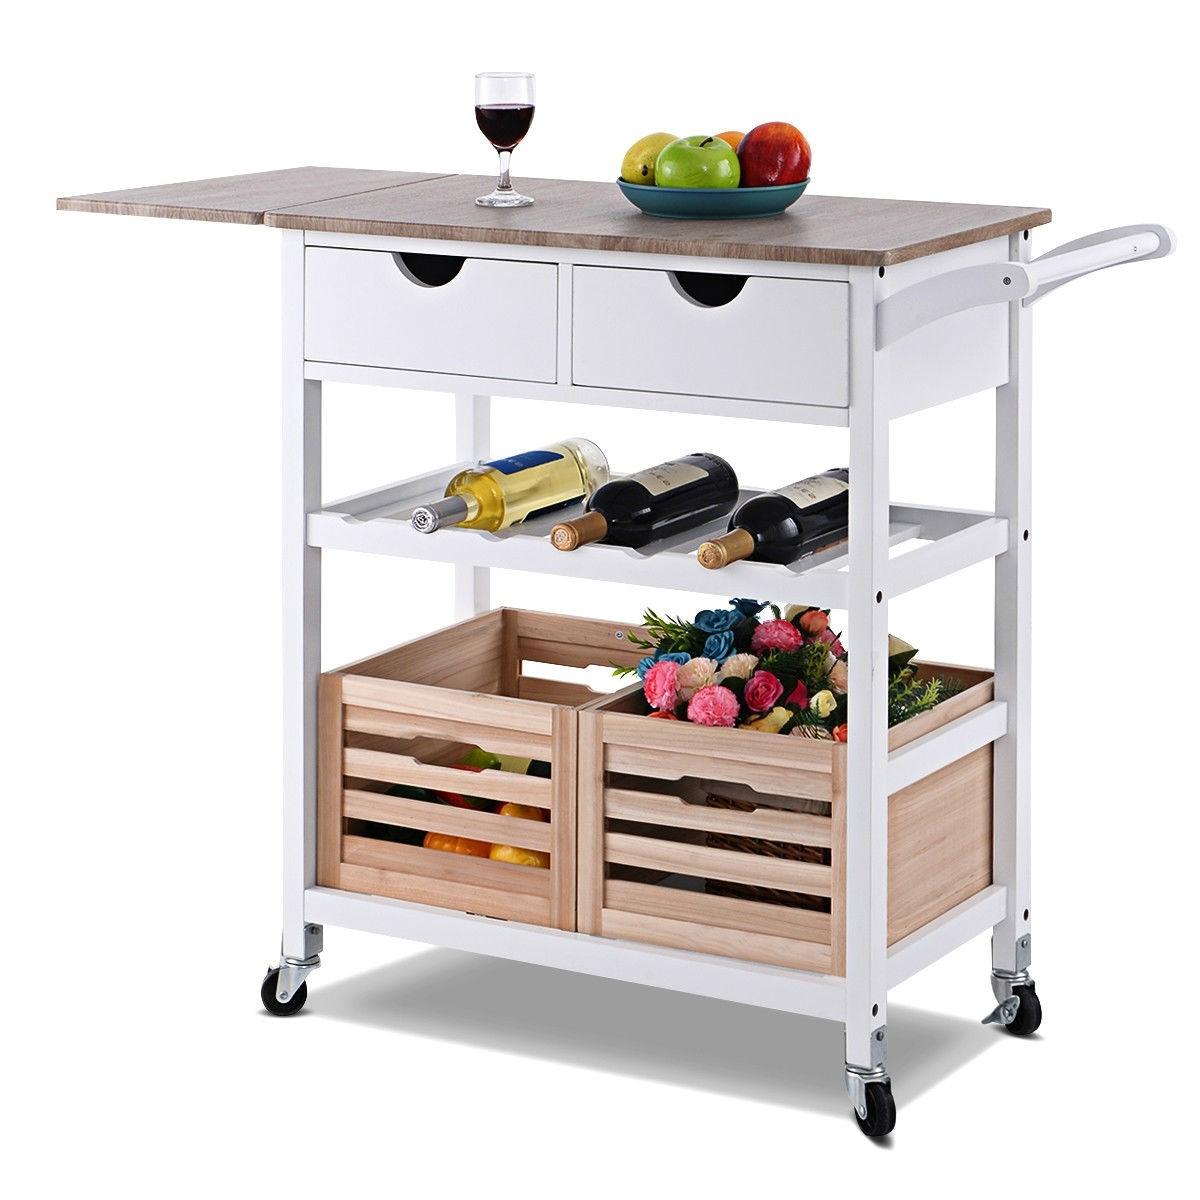 White Wood Kitchen Island Cart With Wine Rack And Wheels Fastfurnishings